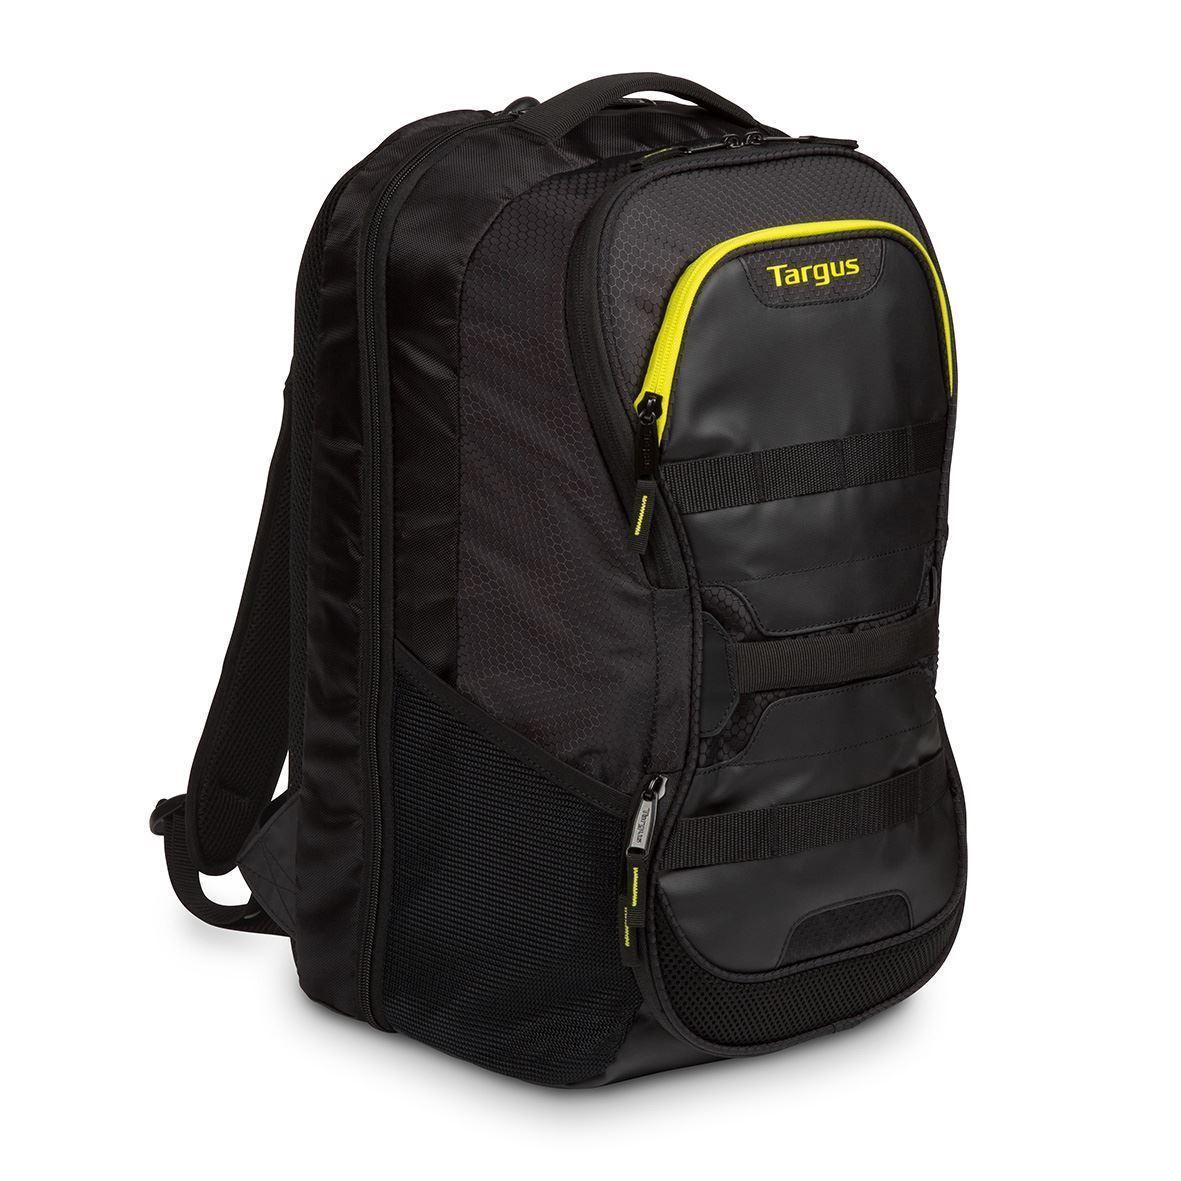 1181x1181 Laptop Backpacks